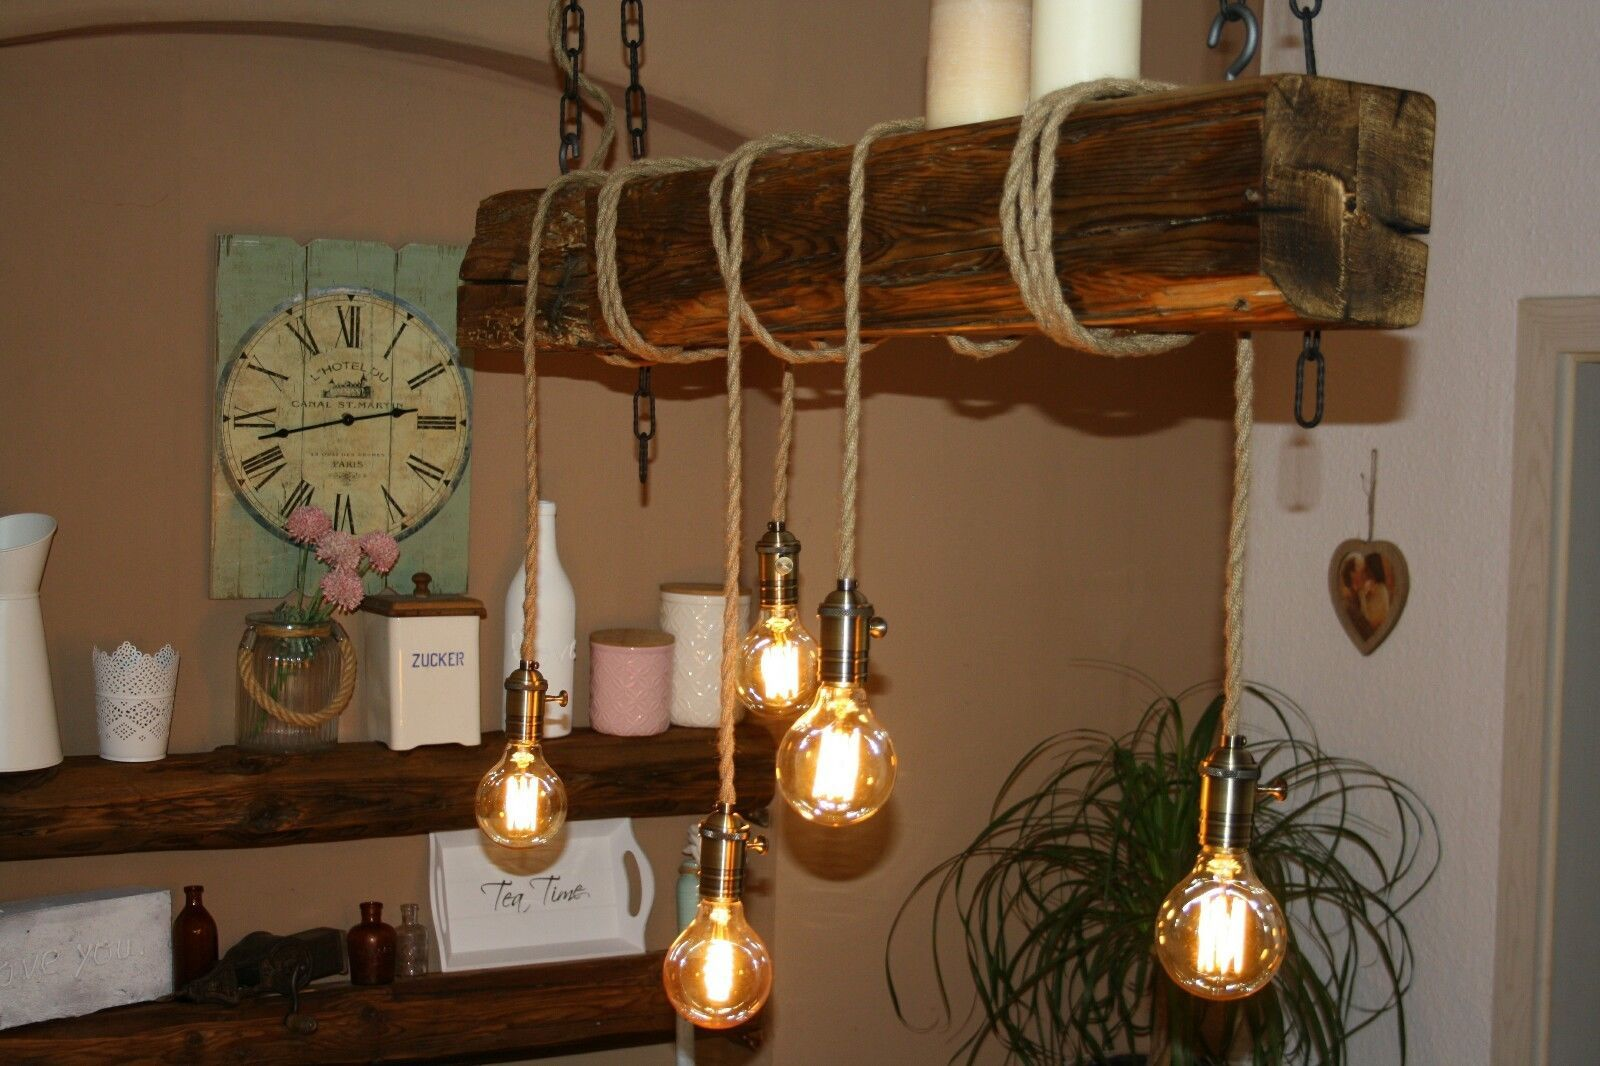 Lampe Aus Alten Balken Lampe Holzbalken Lampe Esstischlampe